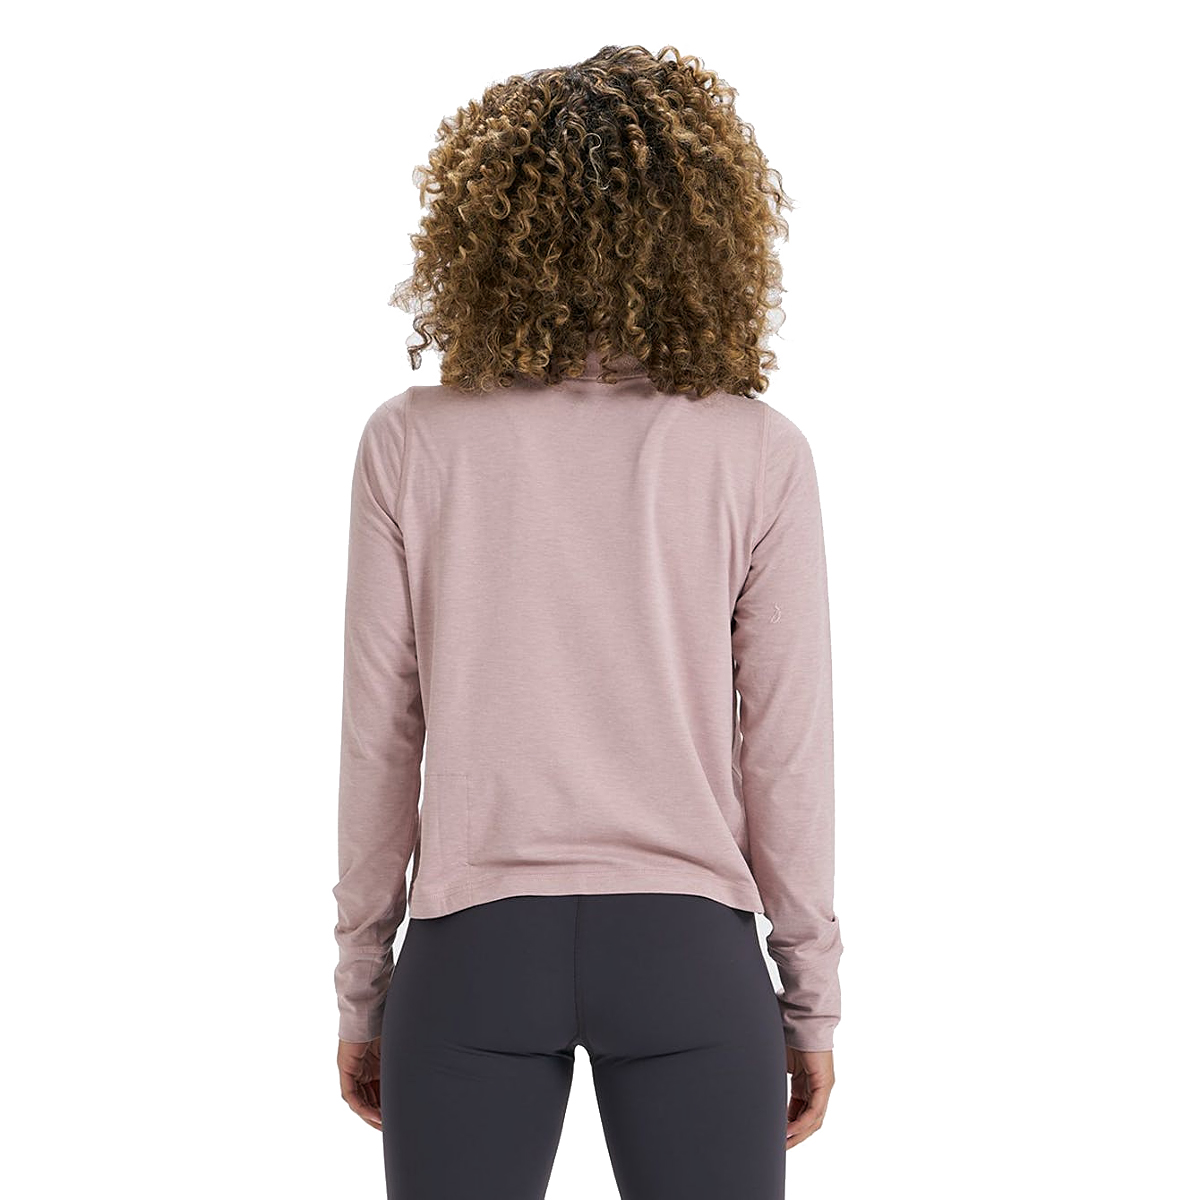 Women's Vuori Crescent Half Zip - Color: Dusk Heather - Size: XS, Dusk Heather, large, image 2